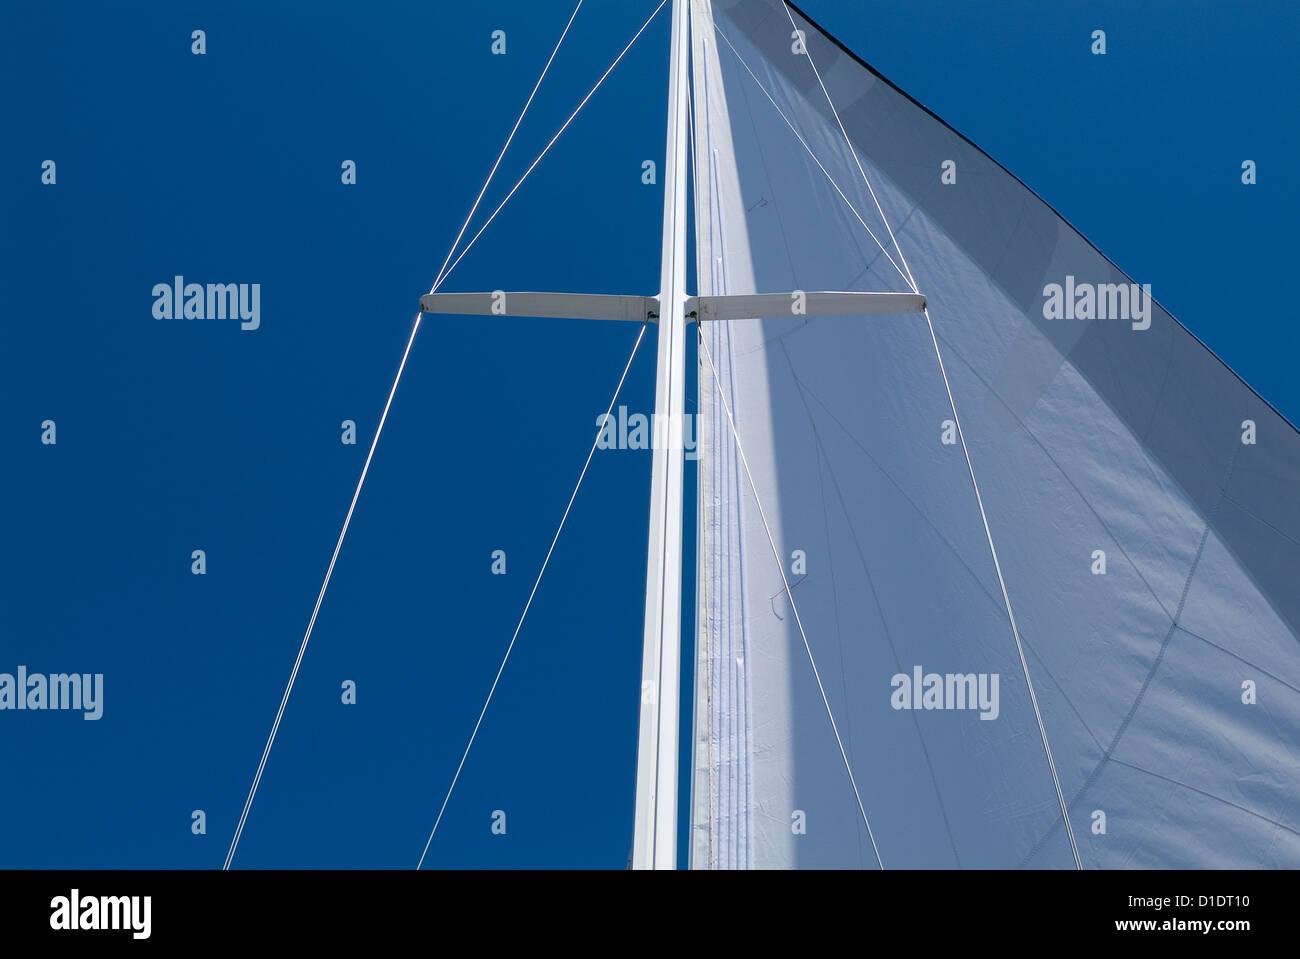 Sailboat mast mainsail, lower shroud, cap shroud and spreader. - Stock Image